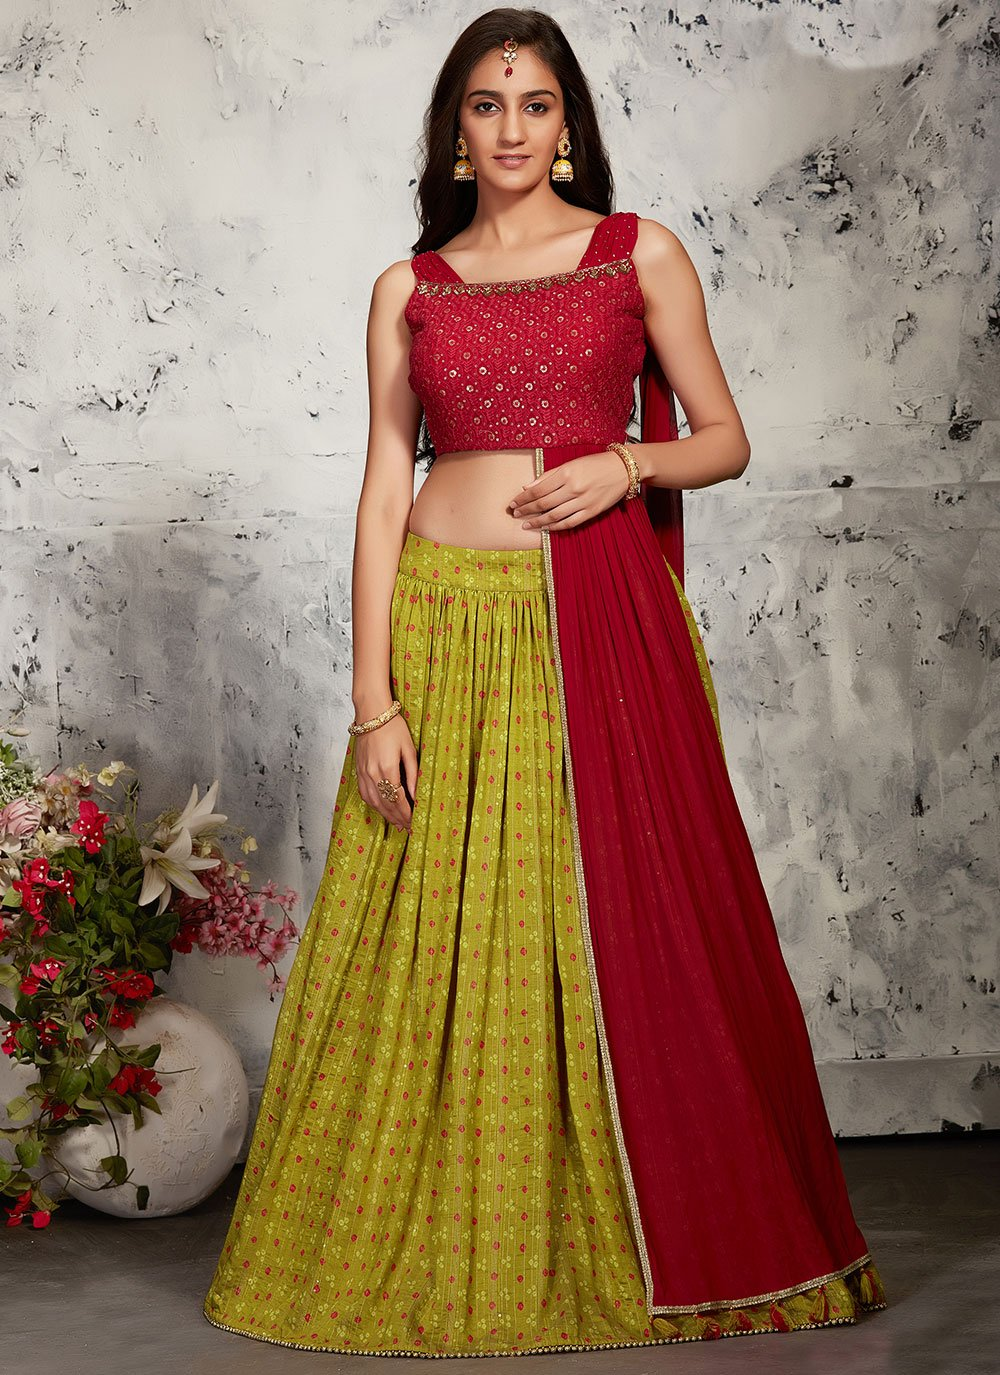 Green and Red Sangeet Readymade Lehenga Choli